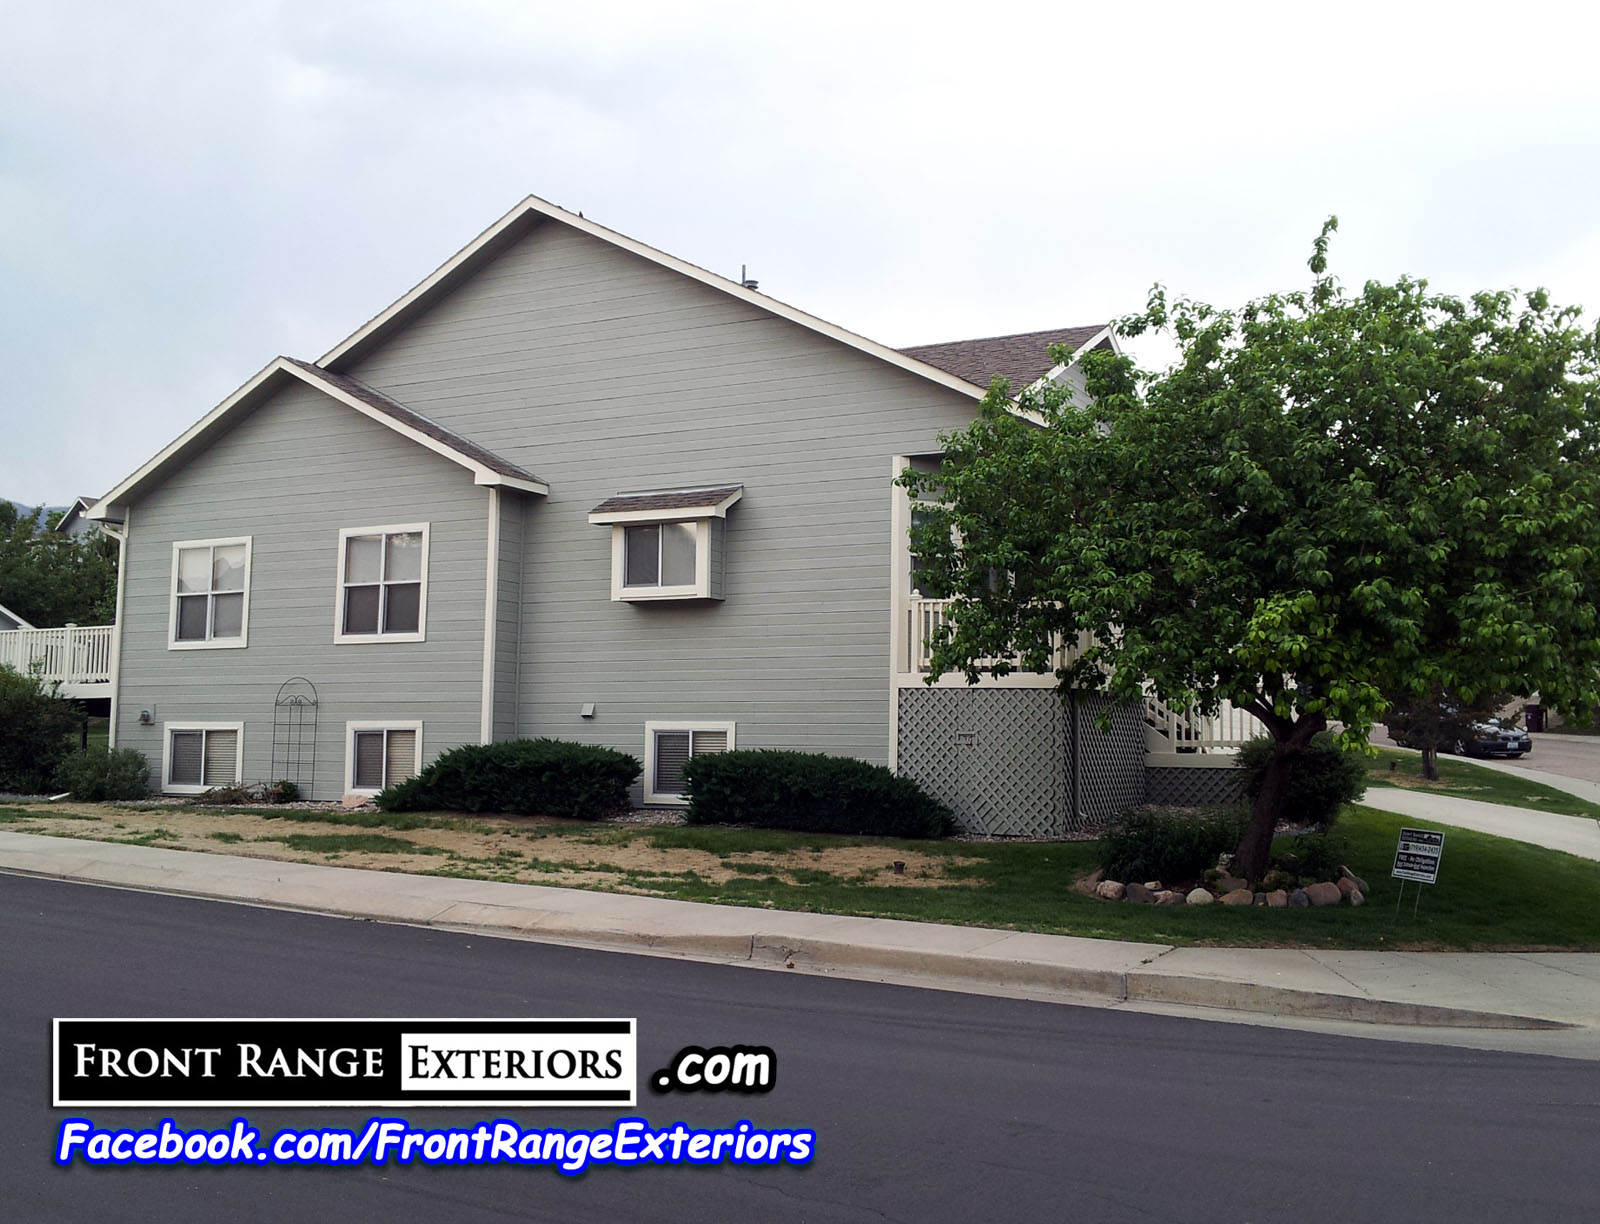 Paint Contractors In Colorado Springs 80919 Front Range Exteriors Inc